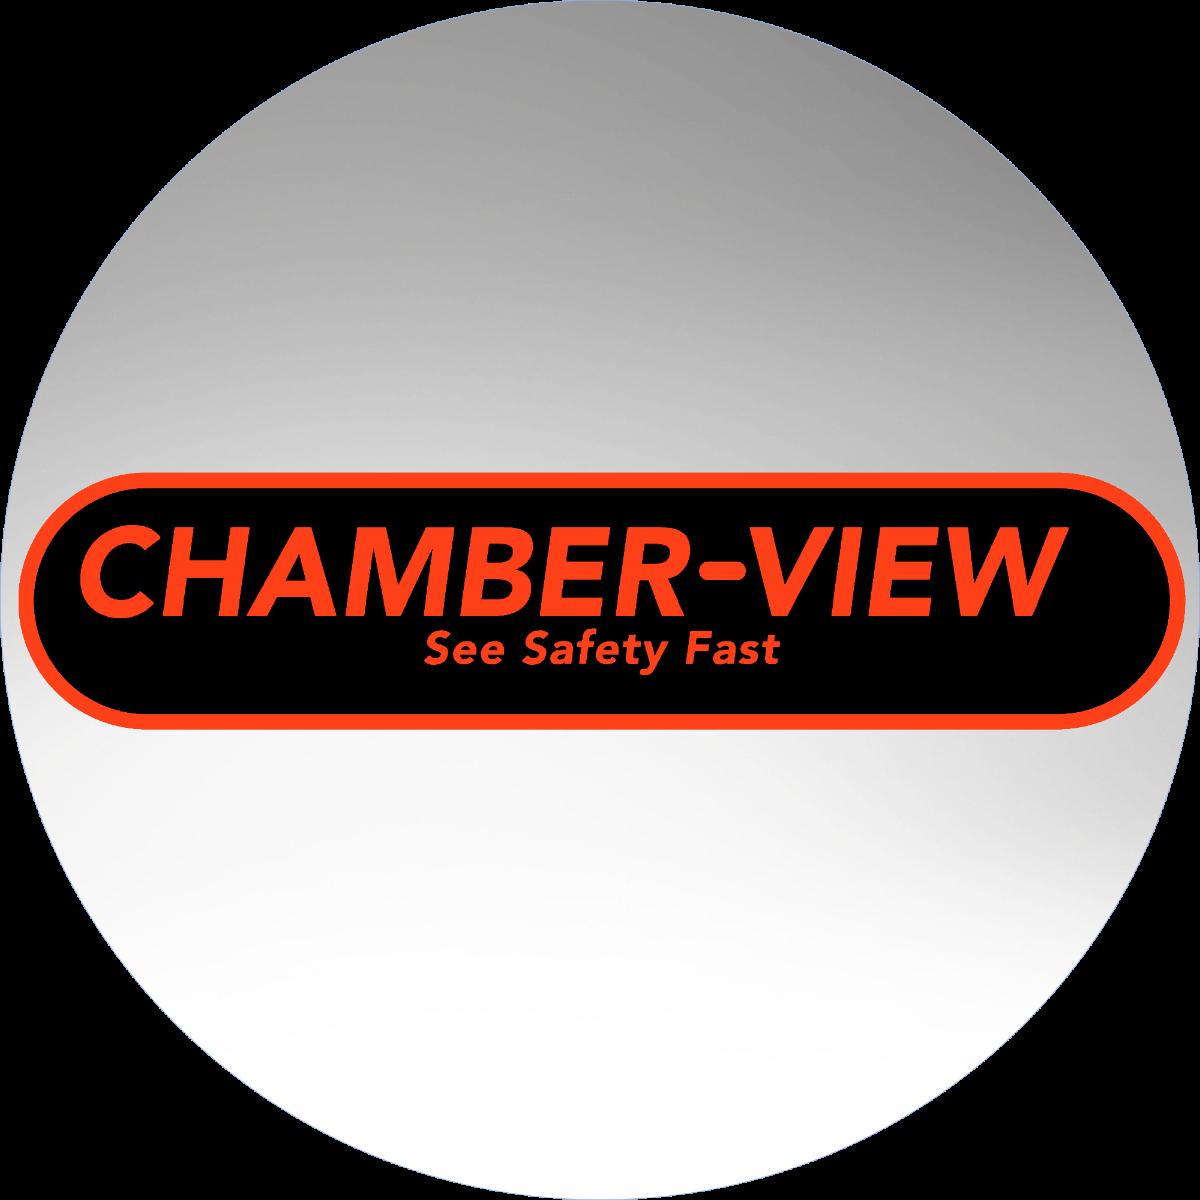 Chamber View